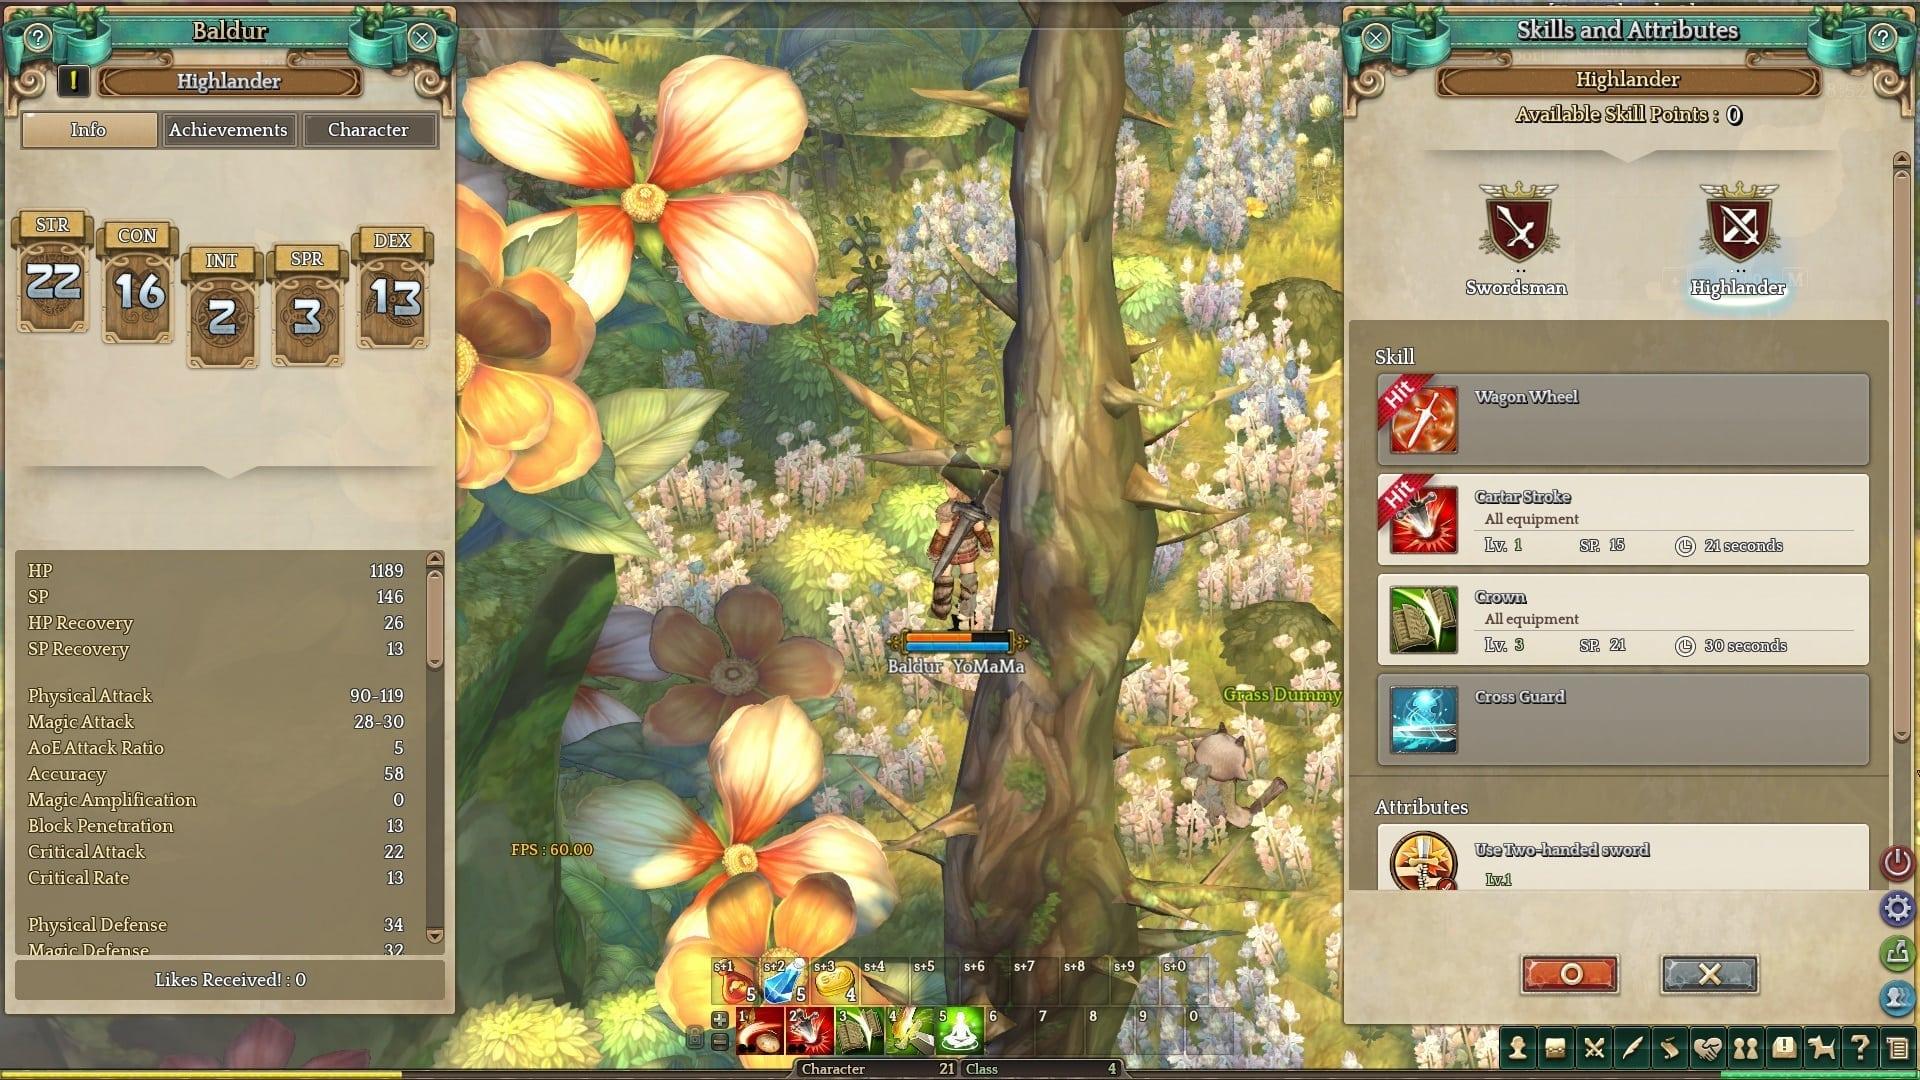 Tree of Savior - Stats and skills